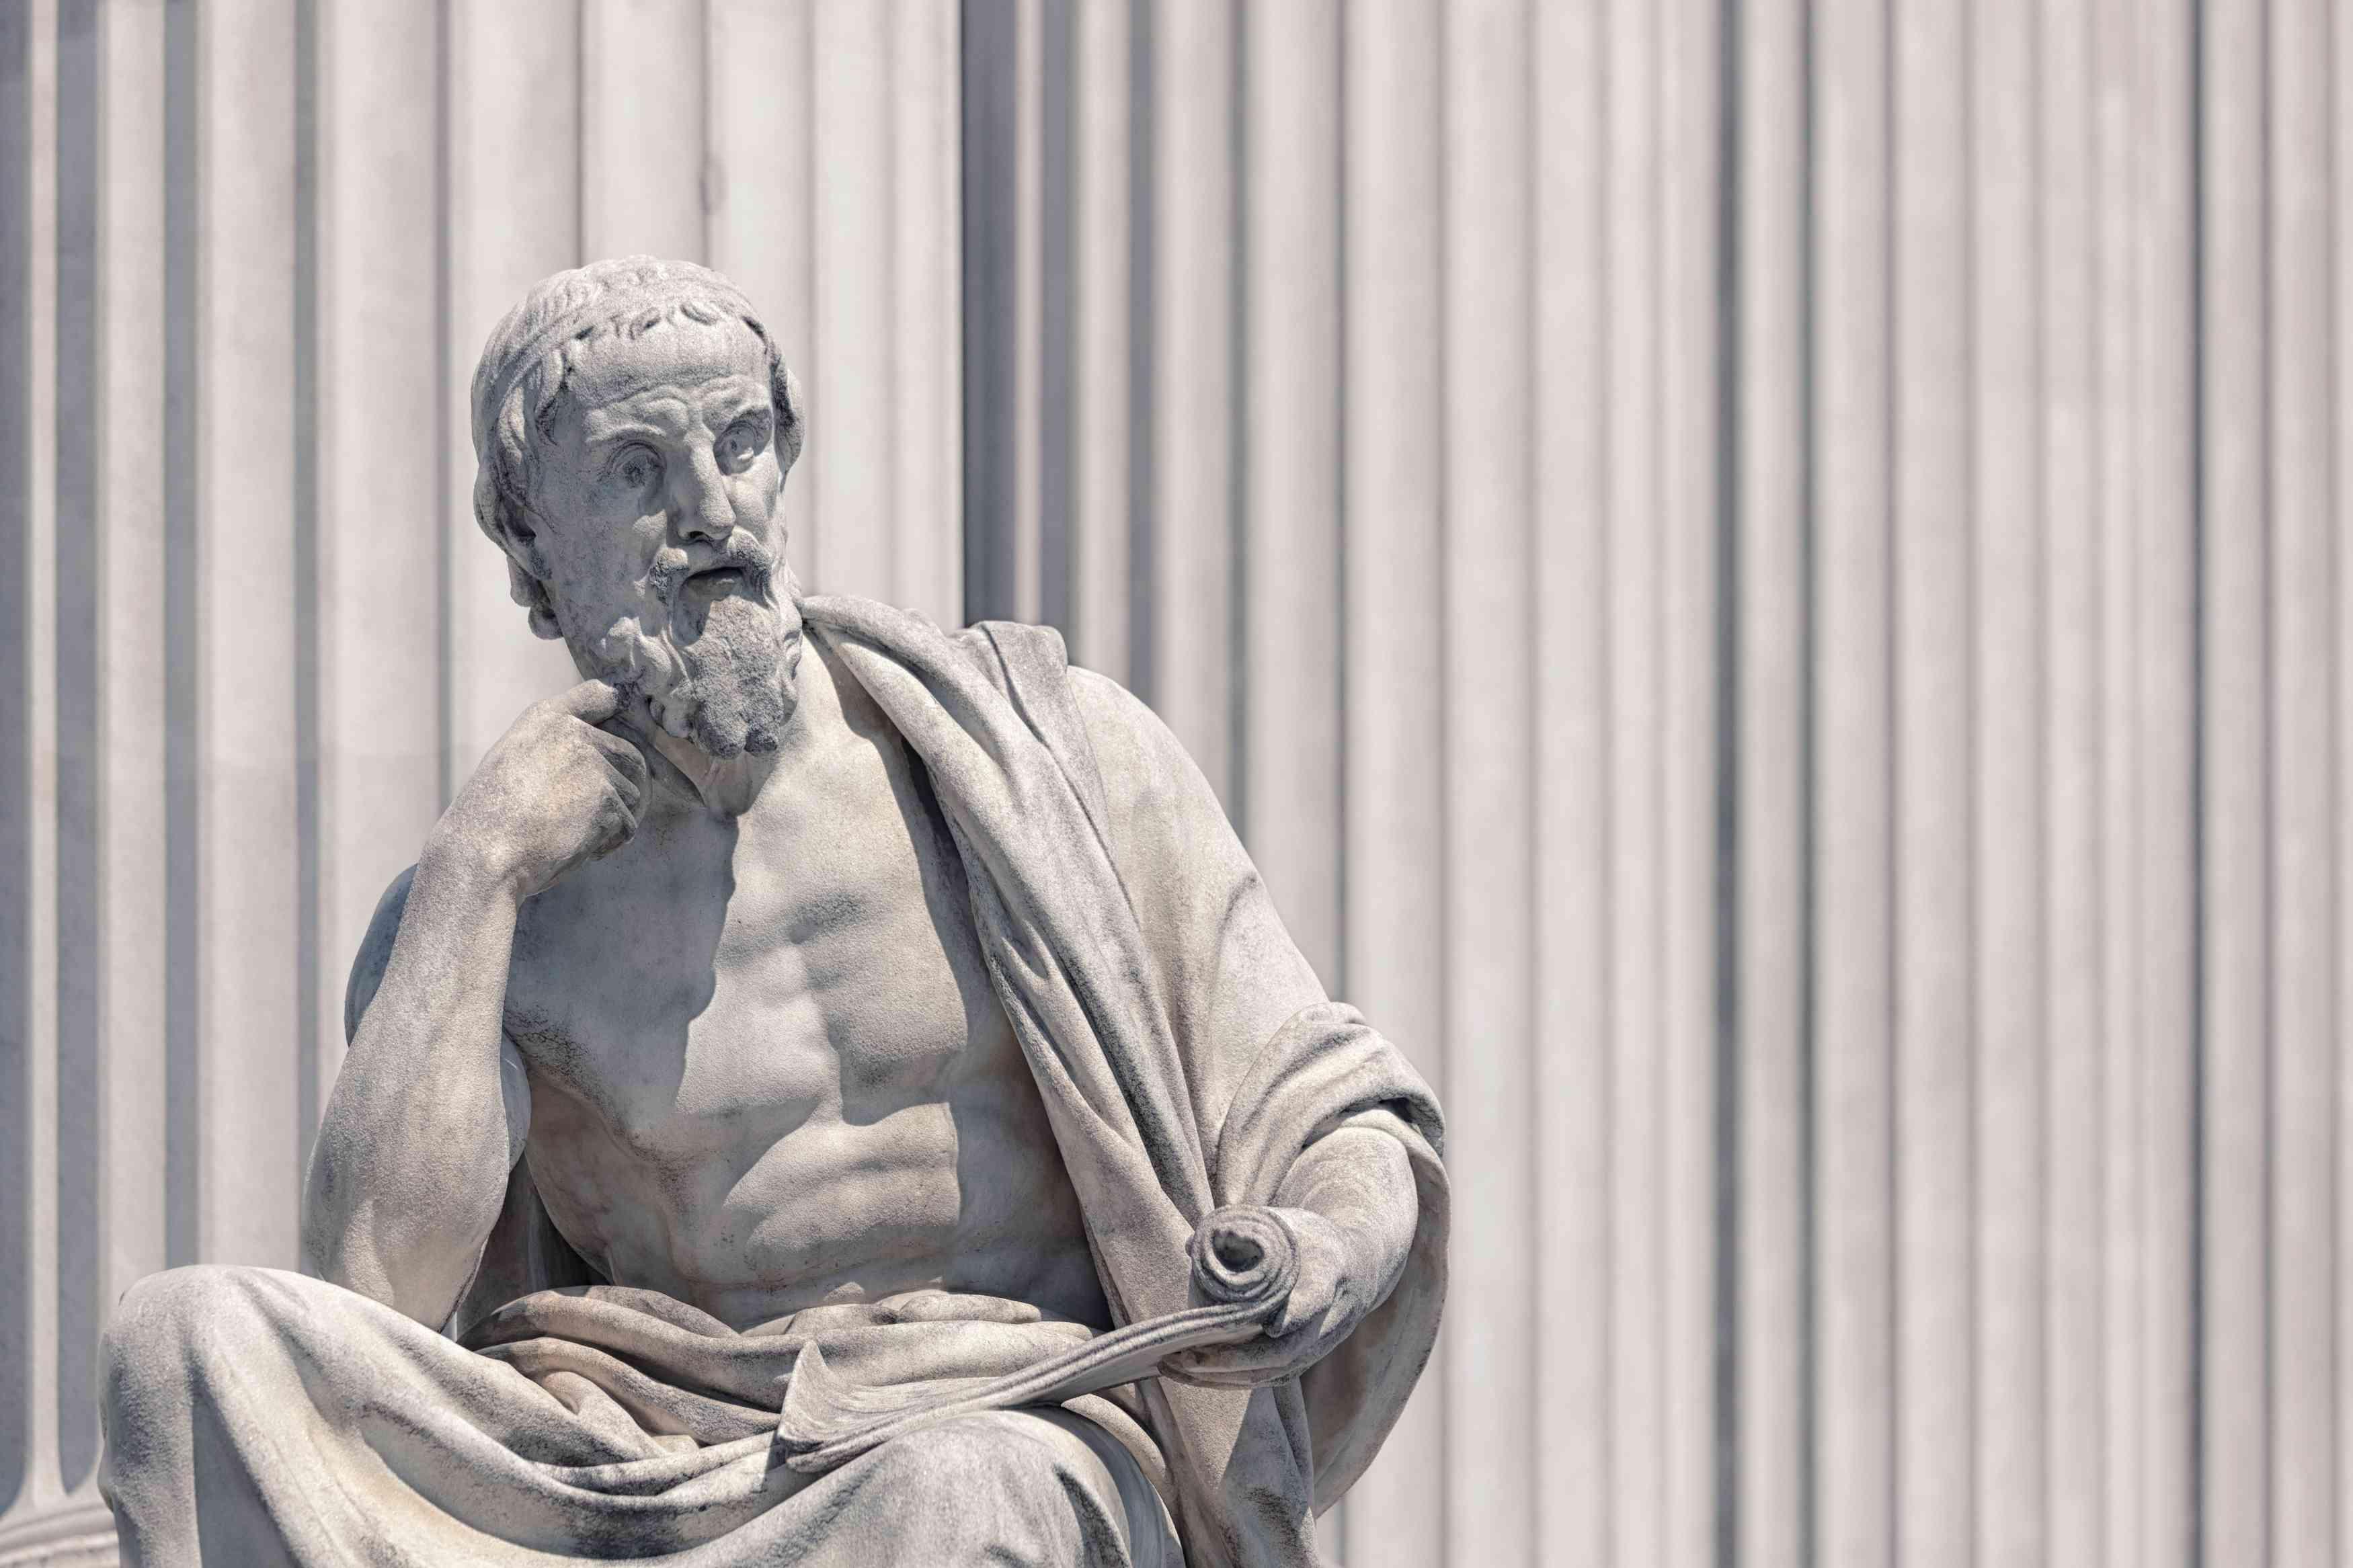 Skulptur des Herodot aus dem 19. Jahrhundert